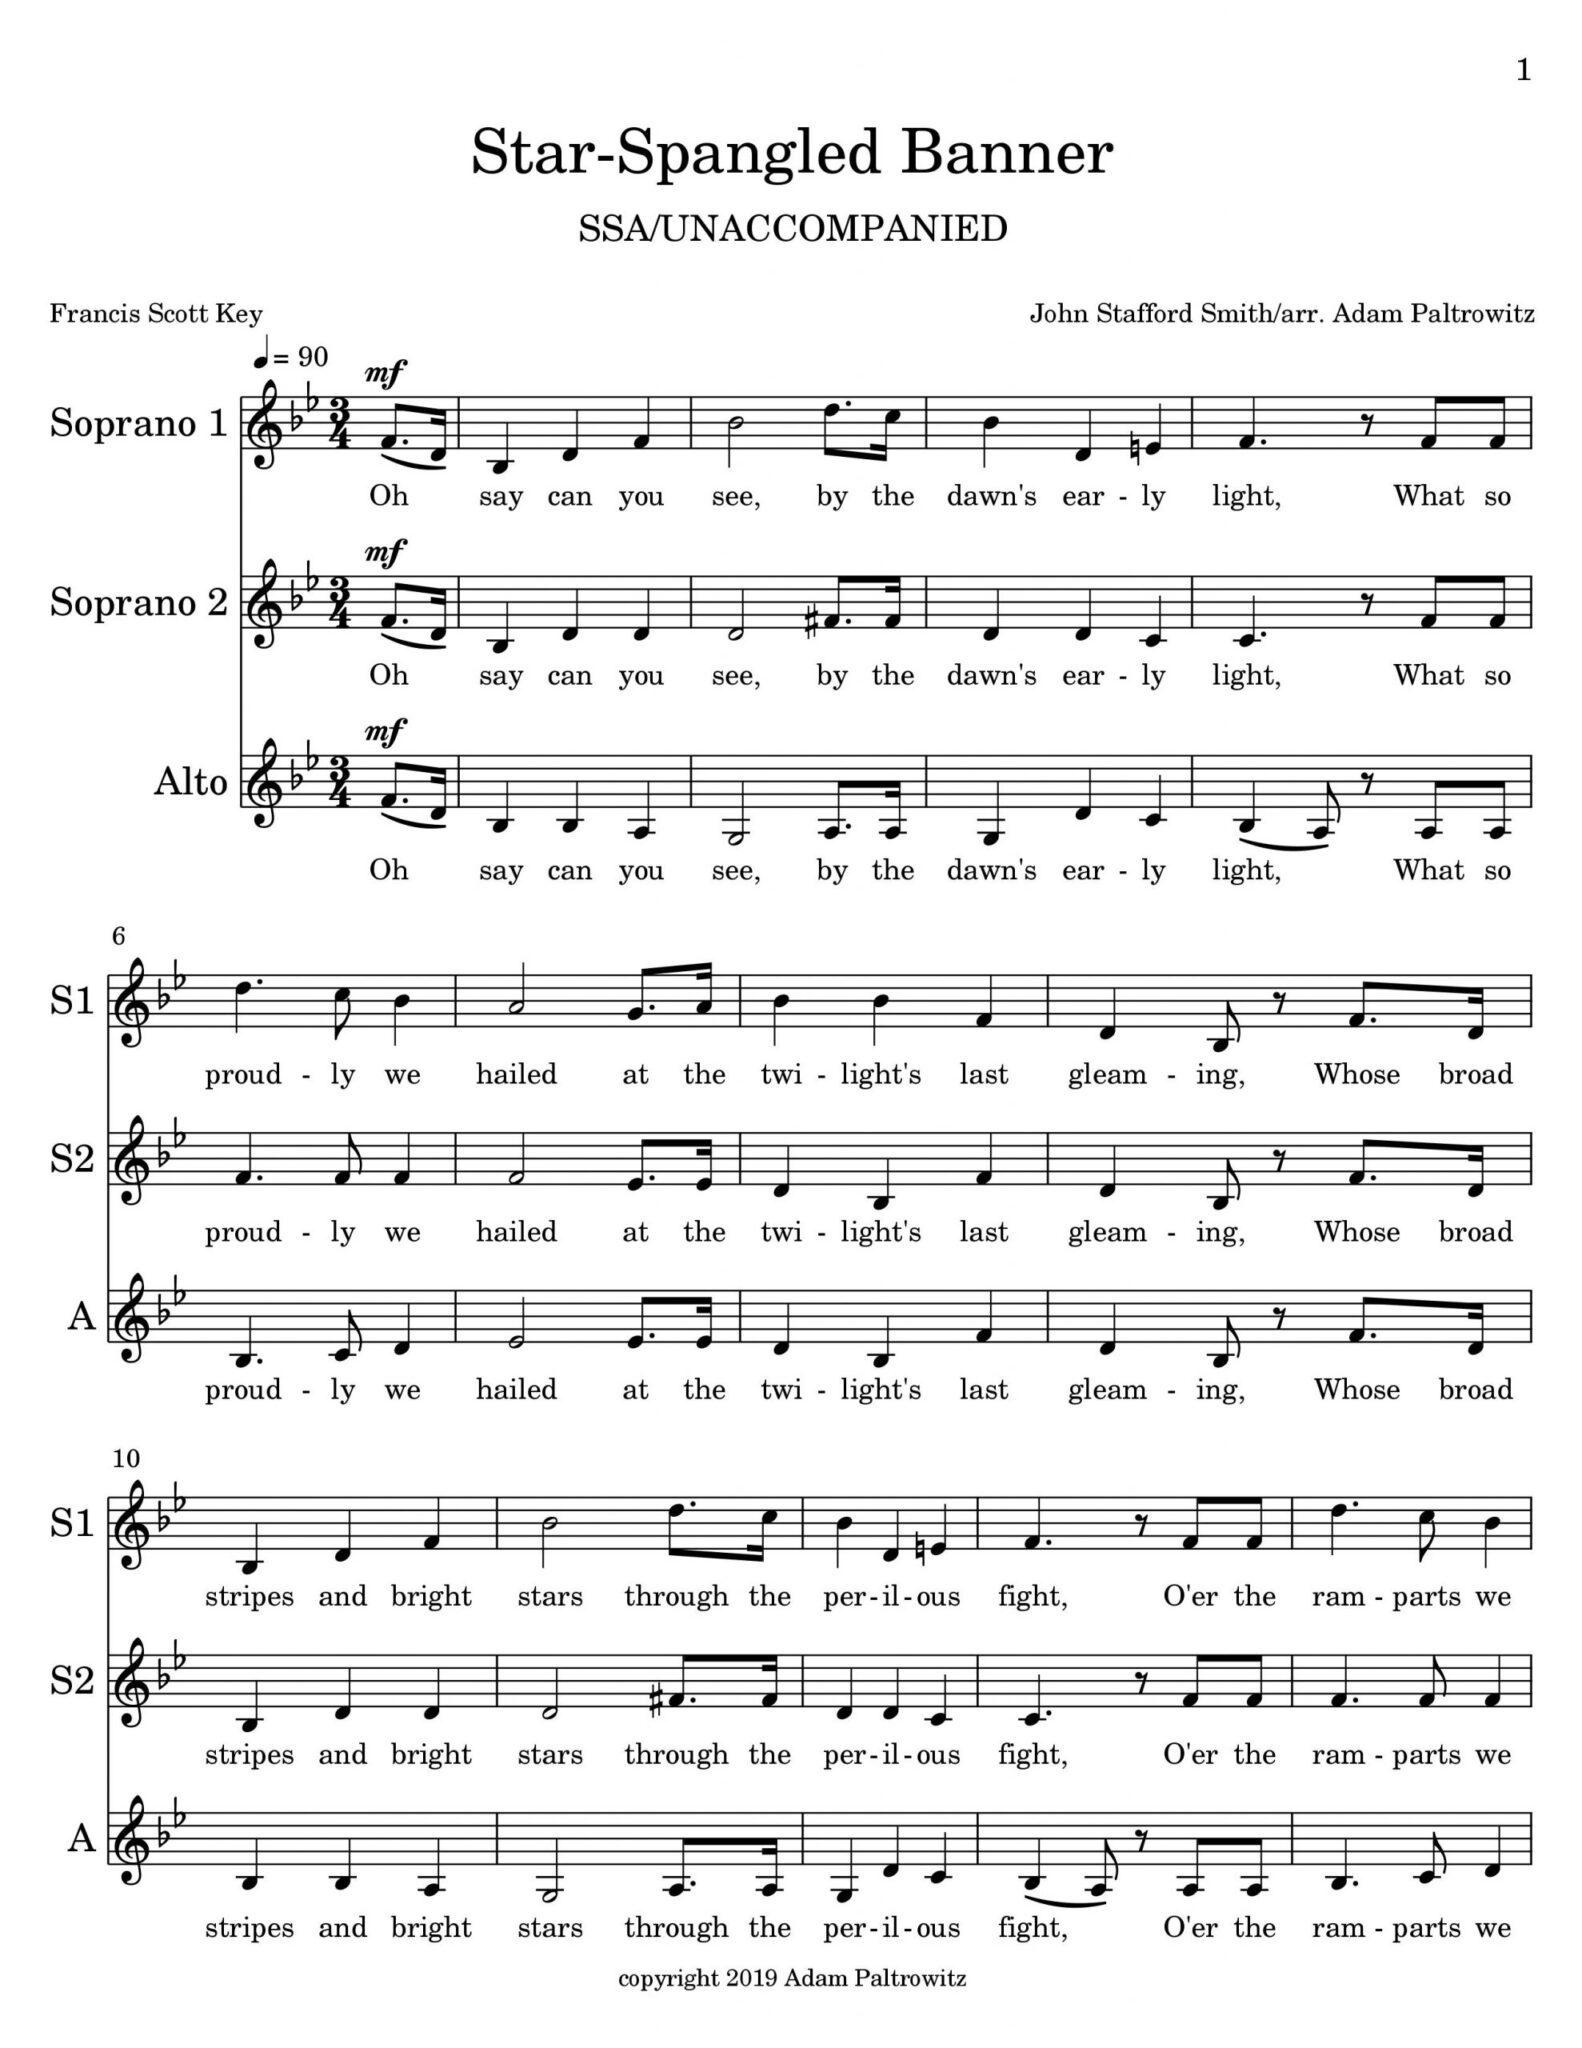 Star-Spangled Banner (SSA - Unaccompanied) - Choral Clarity